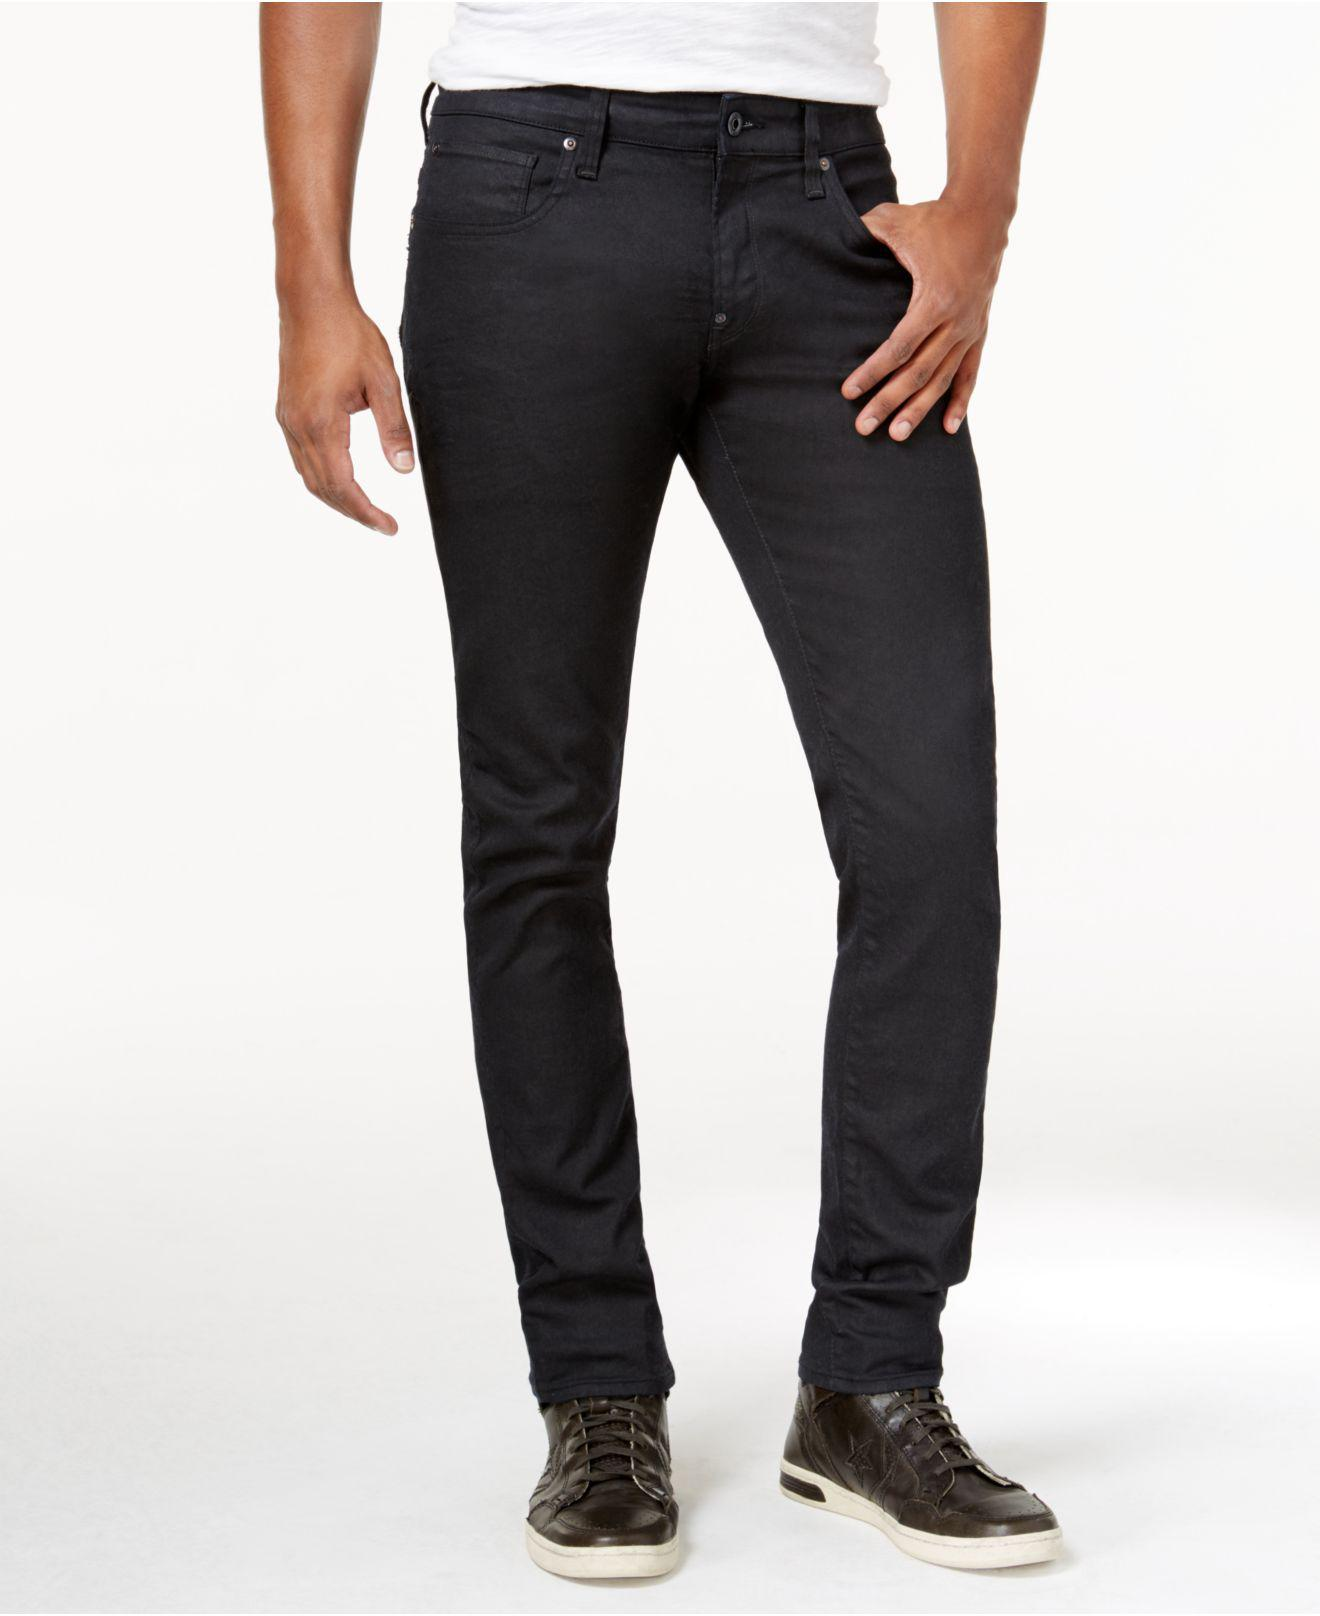 ed8b631ac2d890 G-Star RAW Men's Revend Super Slim-fit Jeans in Blue for Men - Lyst